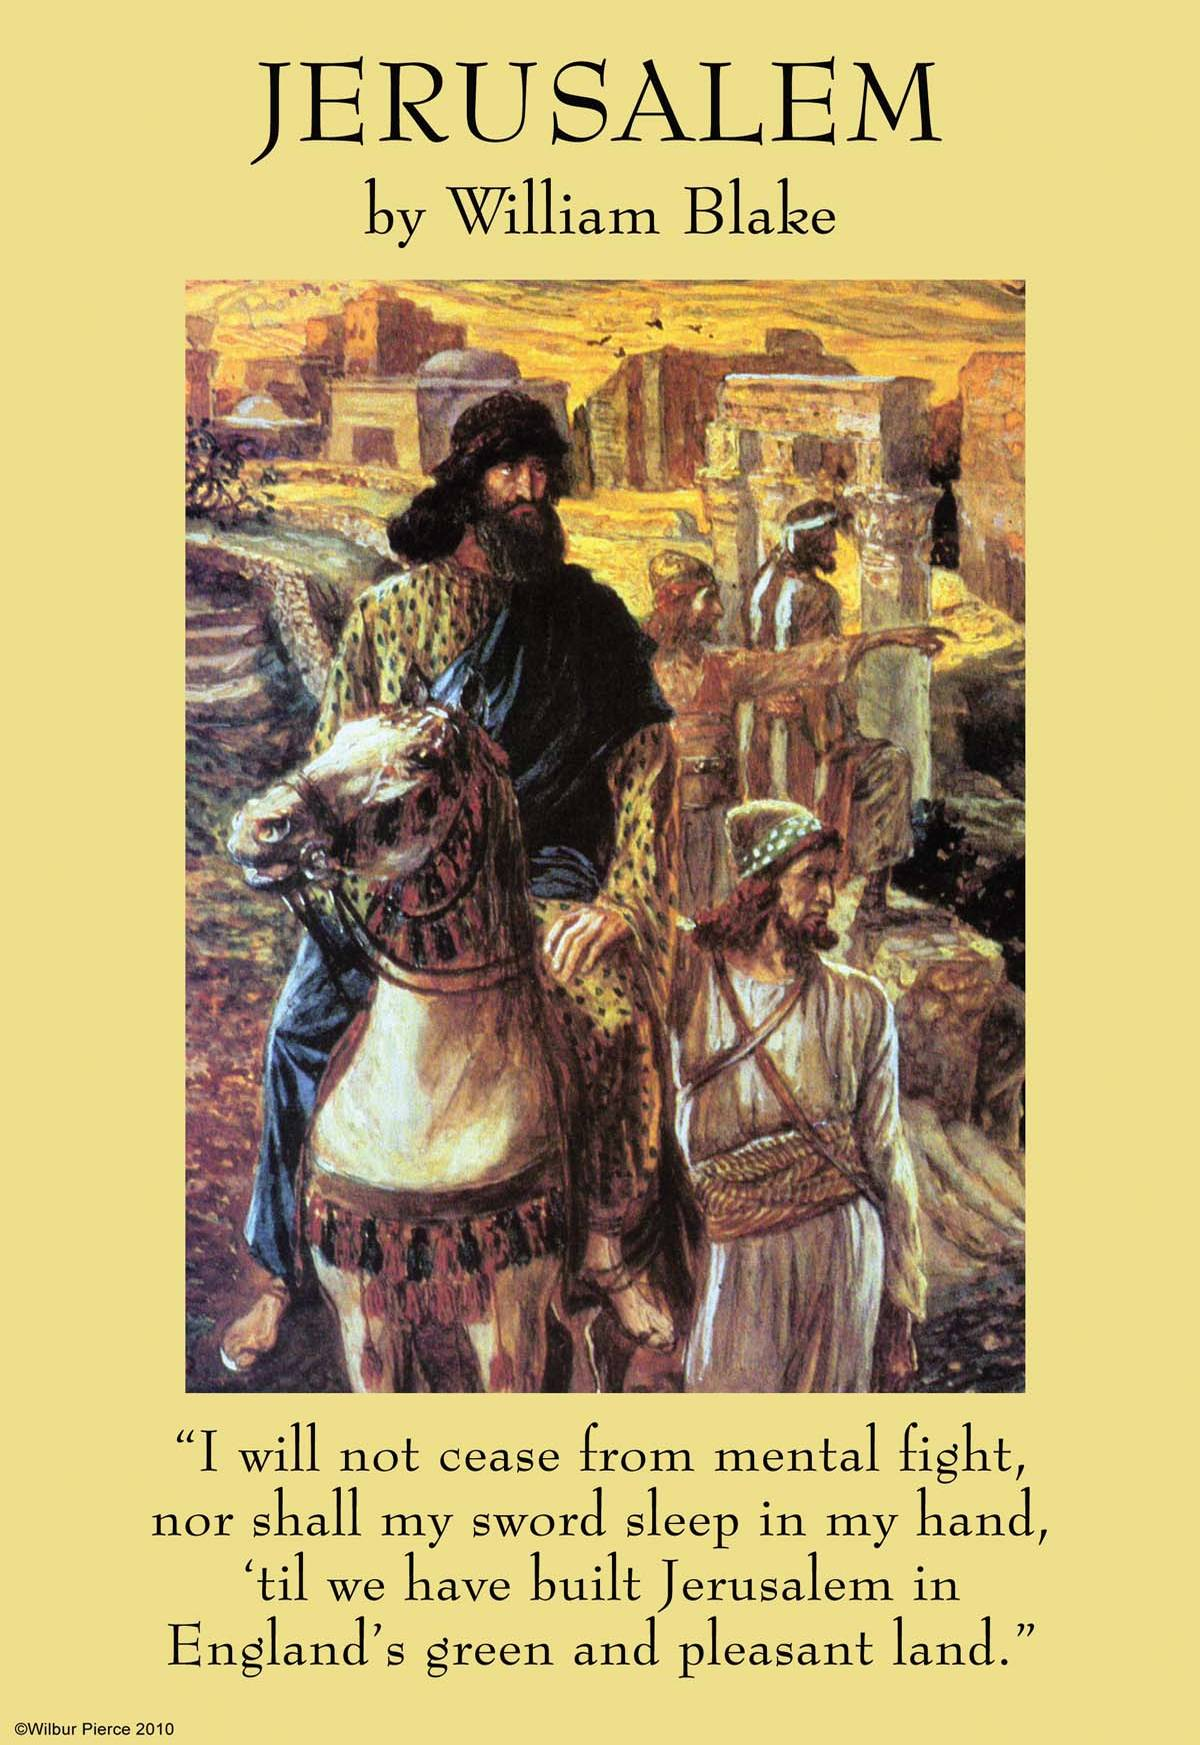 Book Cover Art Canvas ~ Jerusalem posters and canvas art prints vintage book